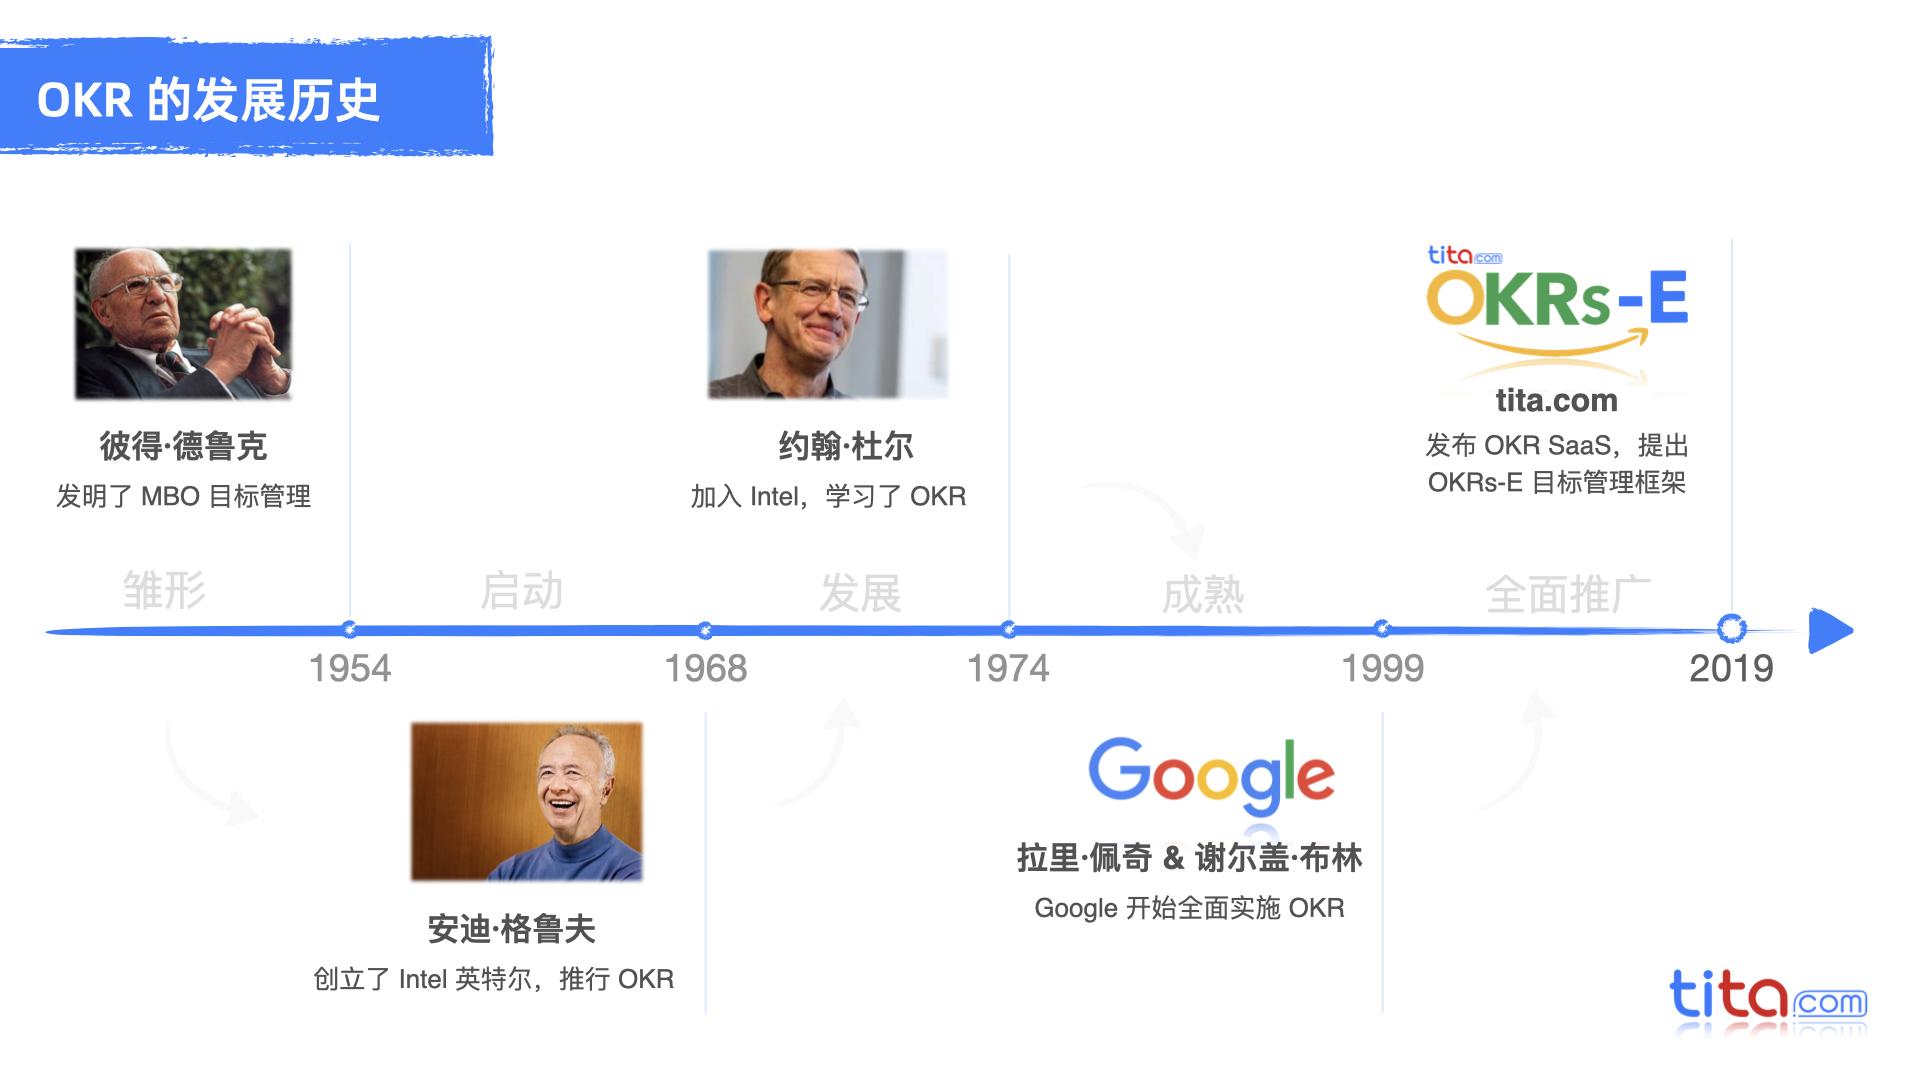 Google、微软为何不用 KPI?